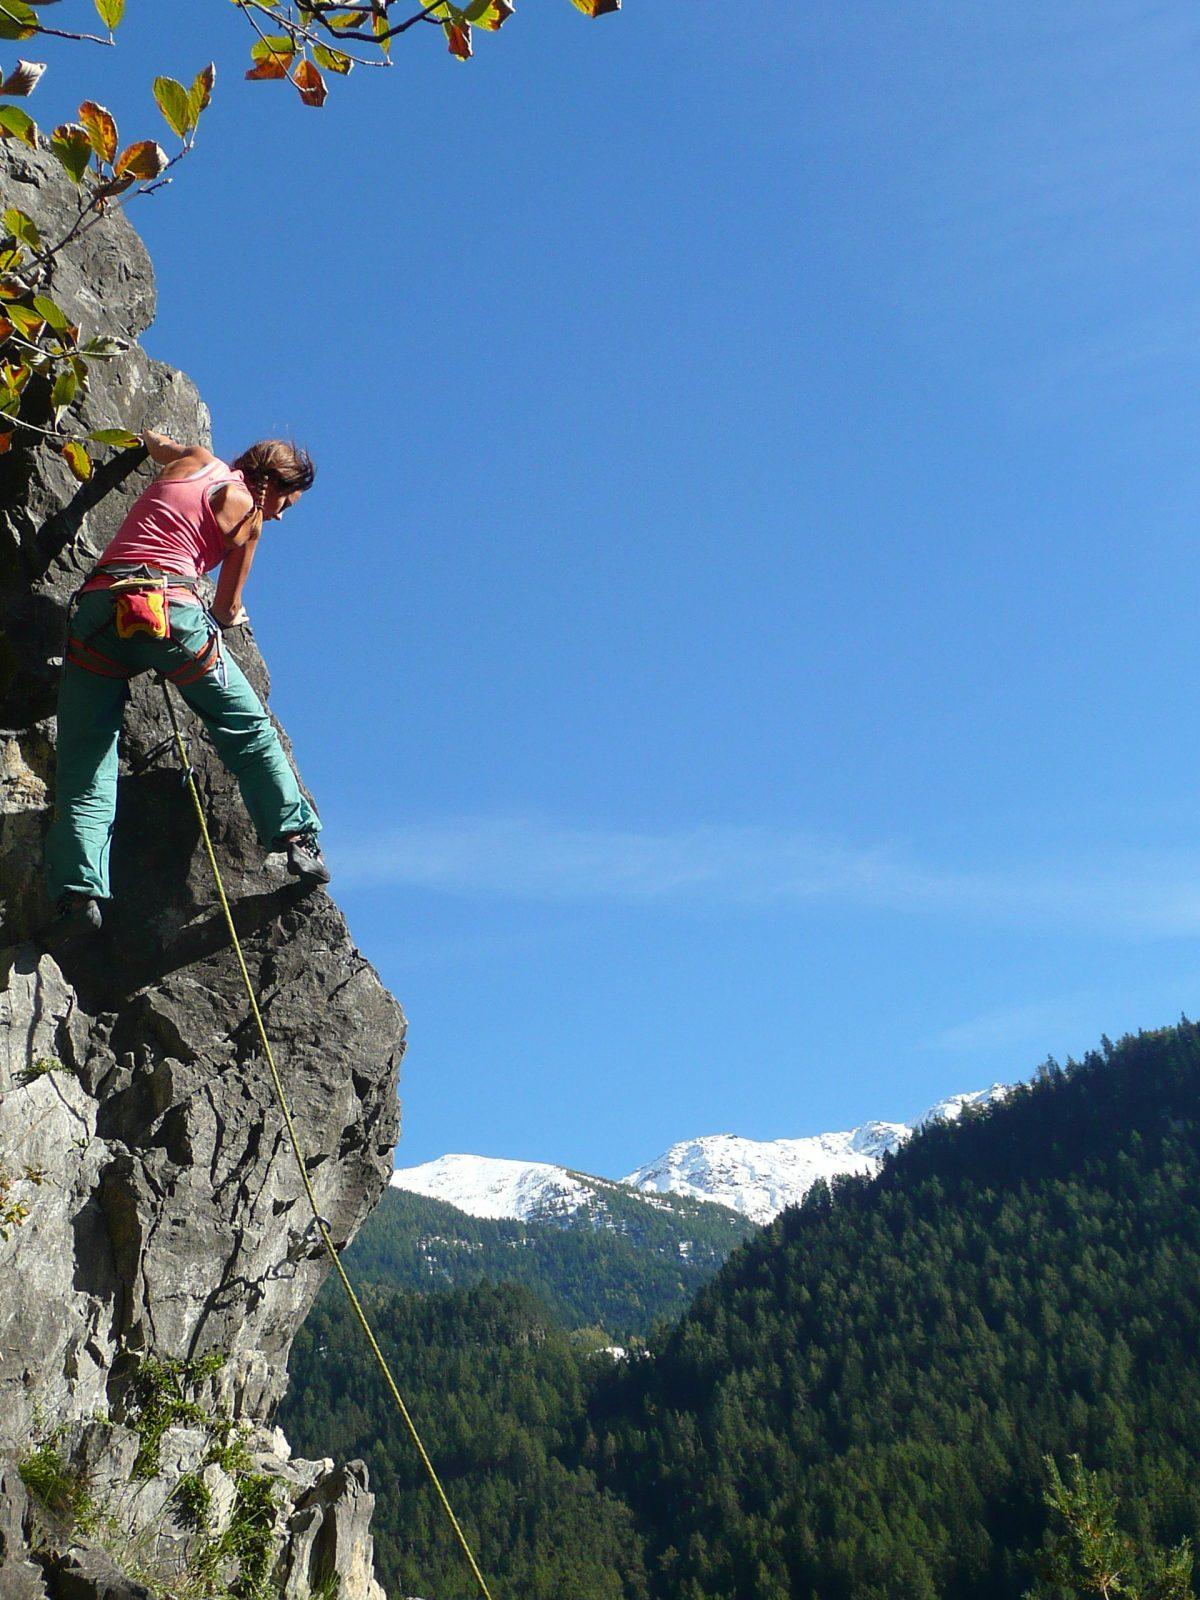 Frühlingsklettern im Klettergarten Starkenbach in der Ferienregion TirolWest, Foto: Simon Schöpf | Climbers Paradise